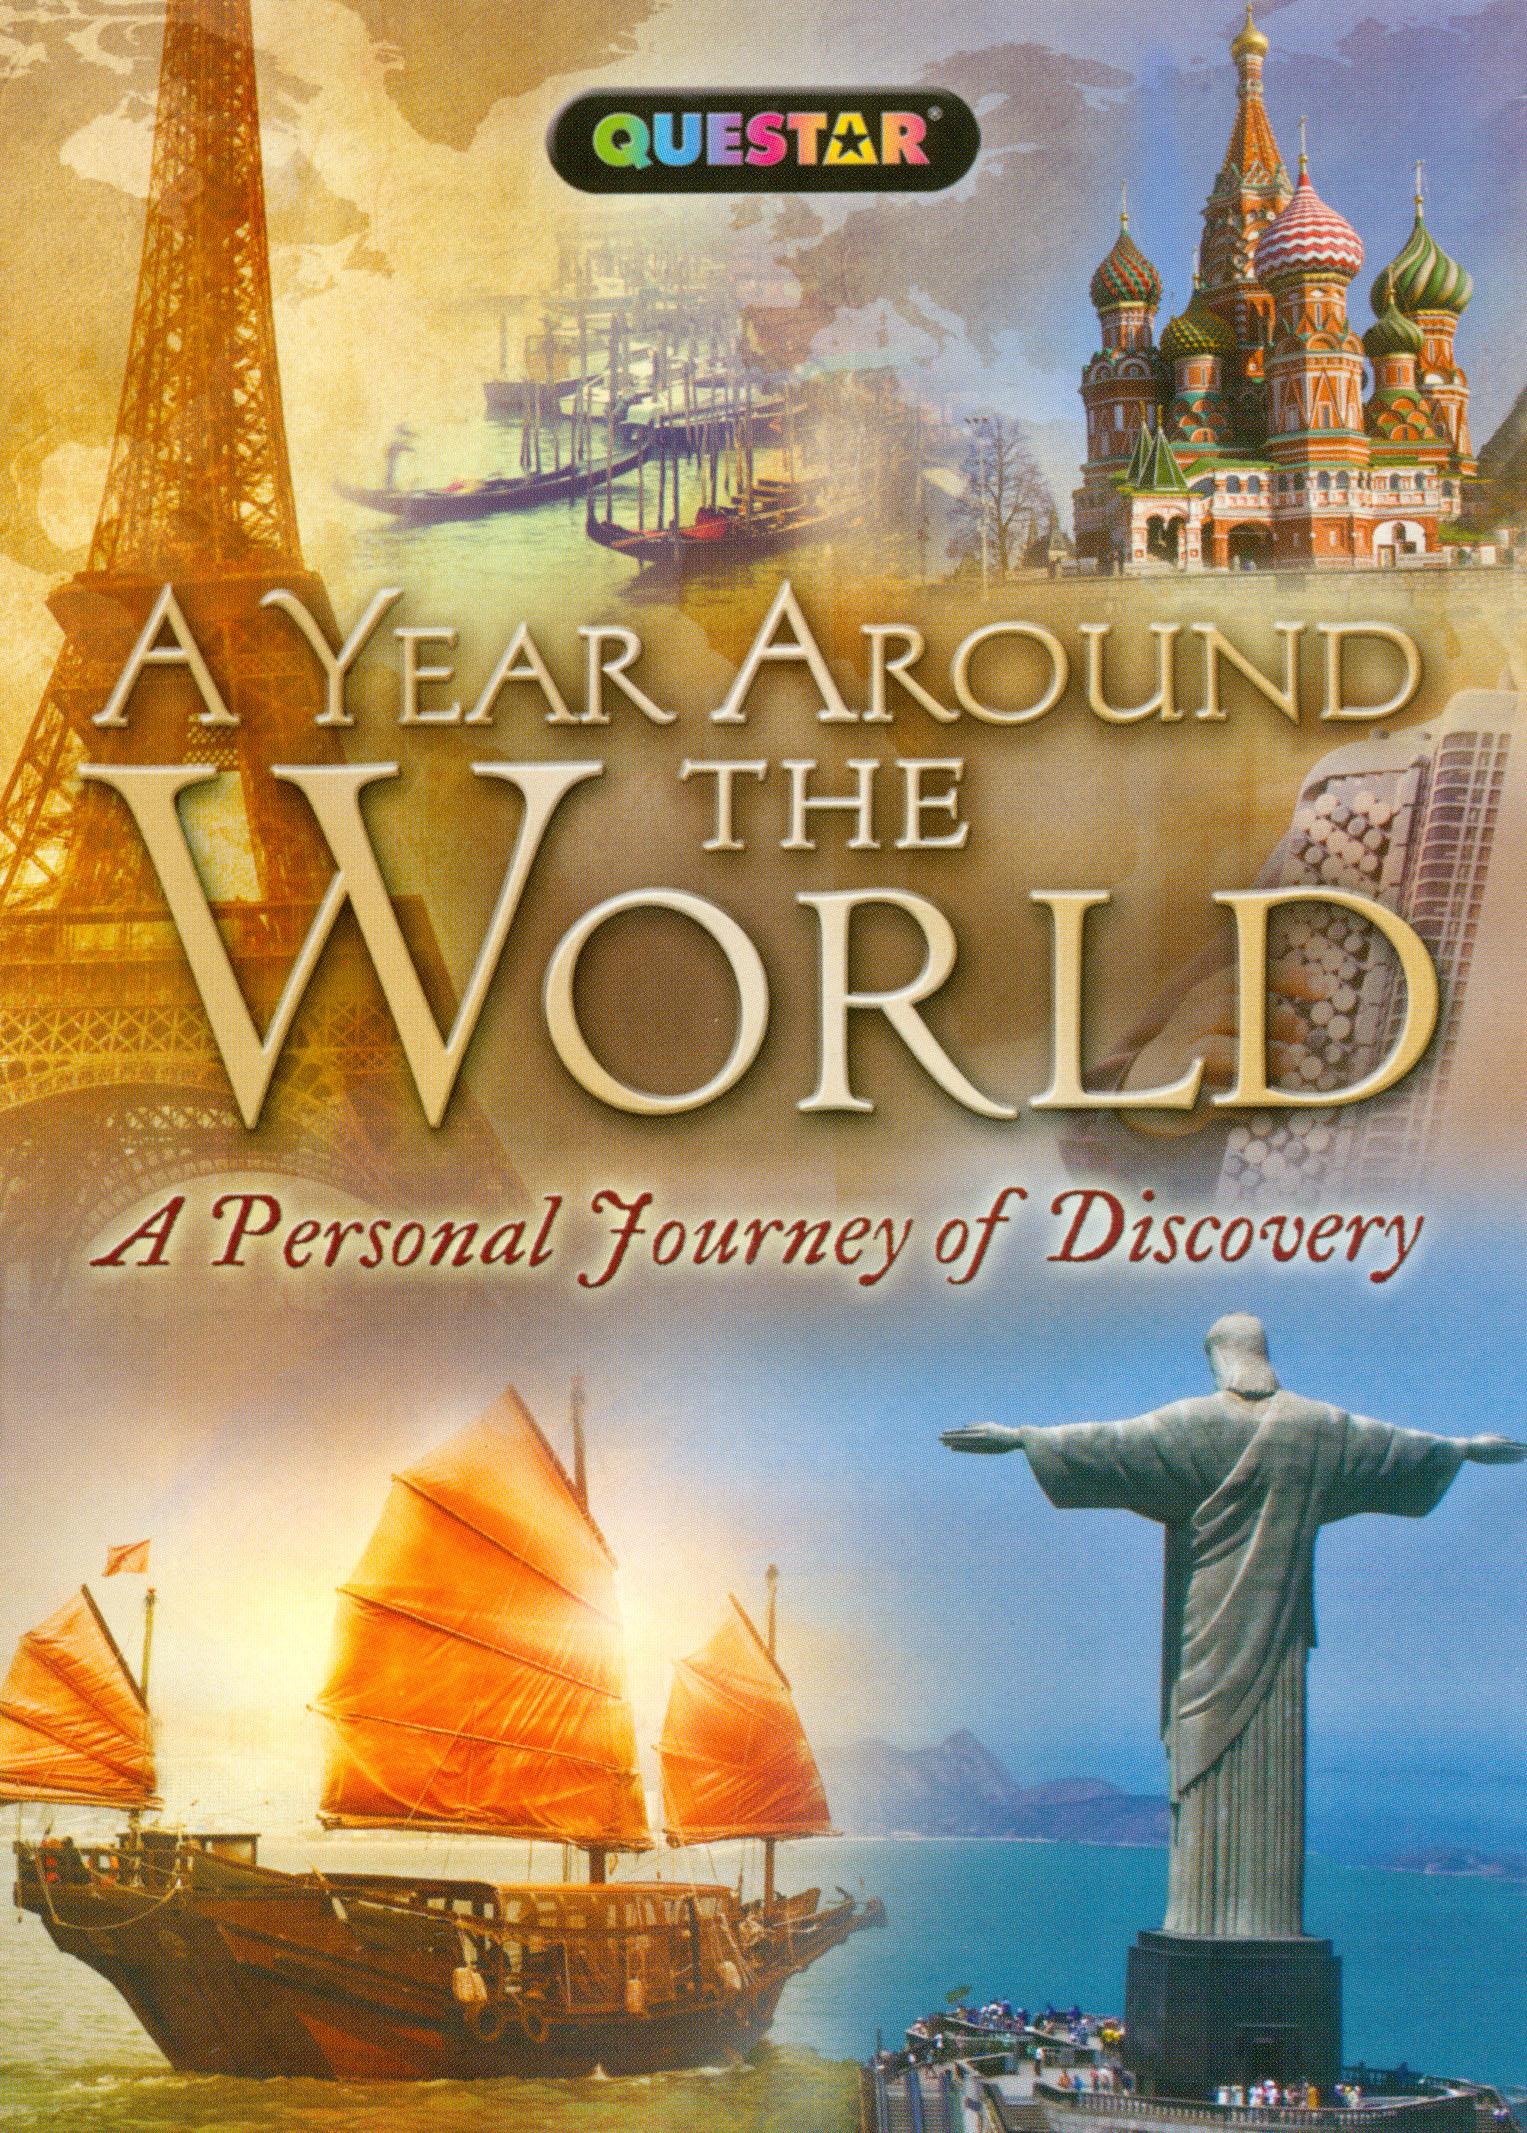 A Year Around the World